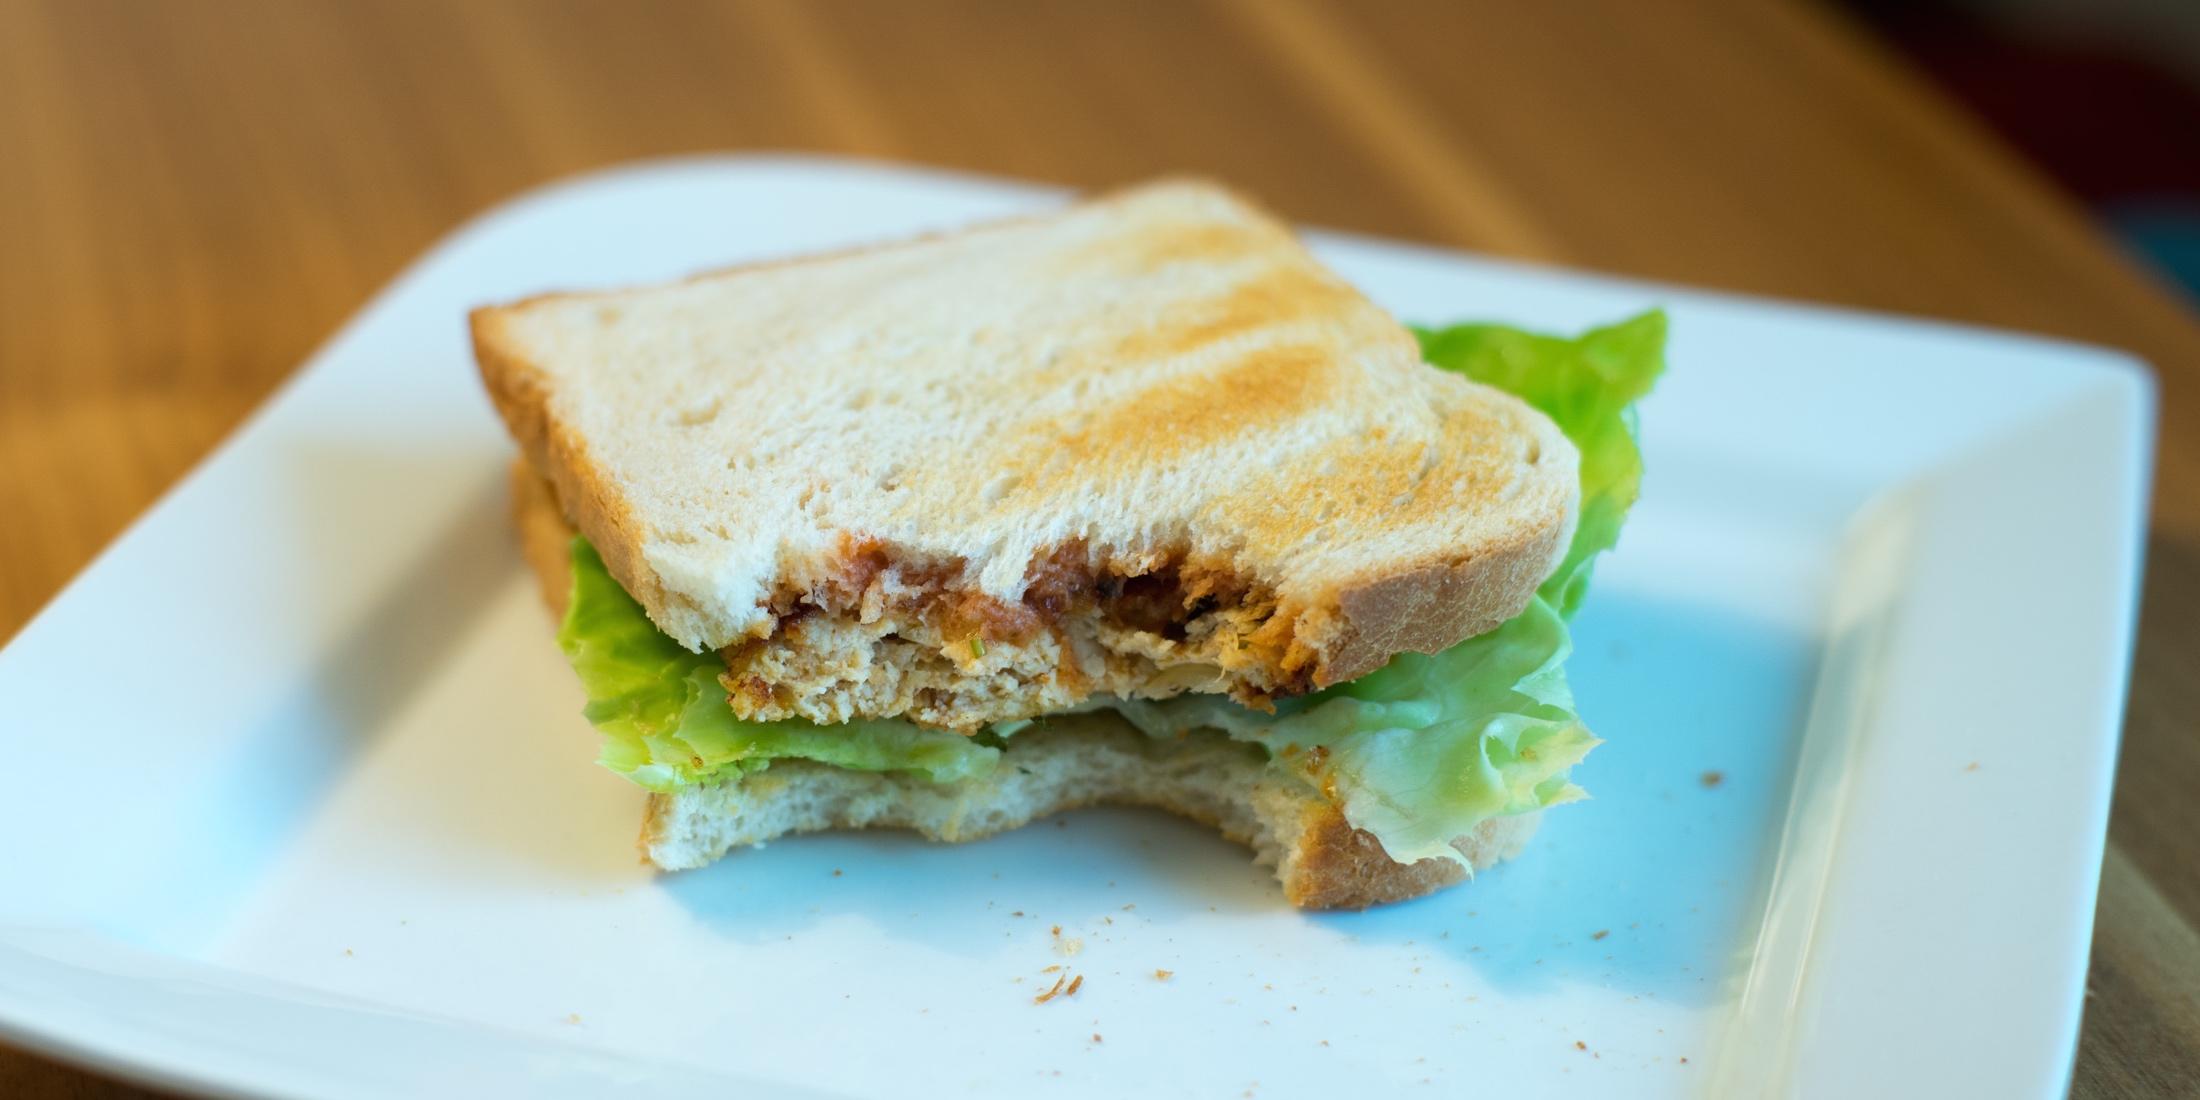 Hühnchen-Sandwich mit Parmesan-Basilikum Panier und Tomatensauce